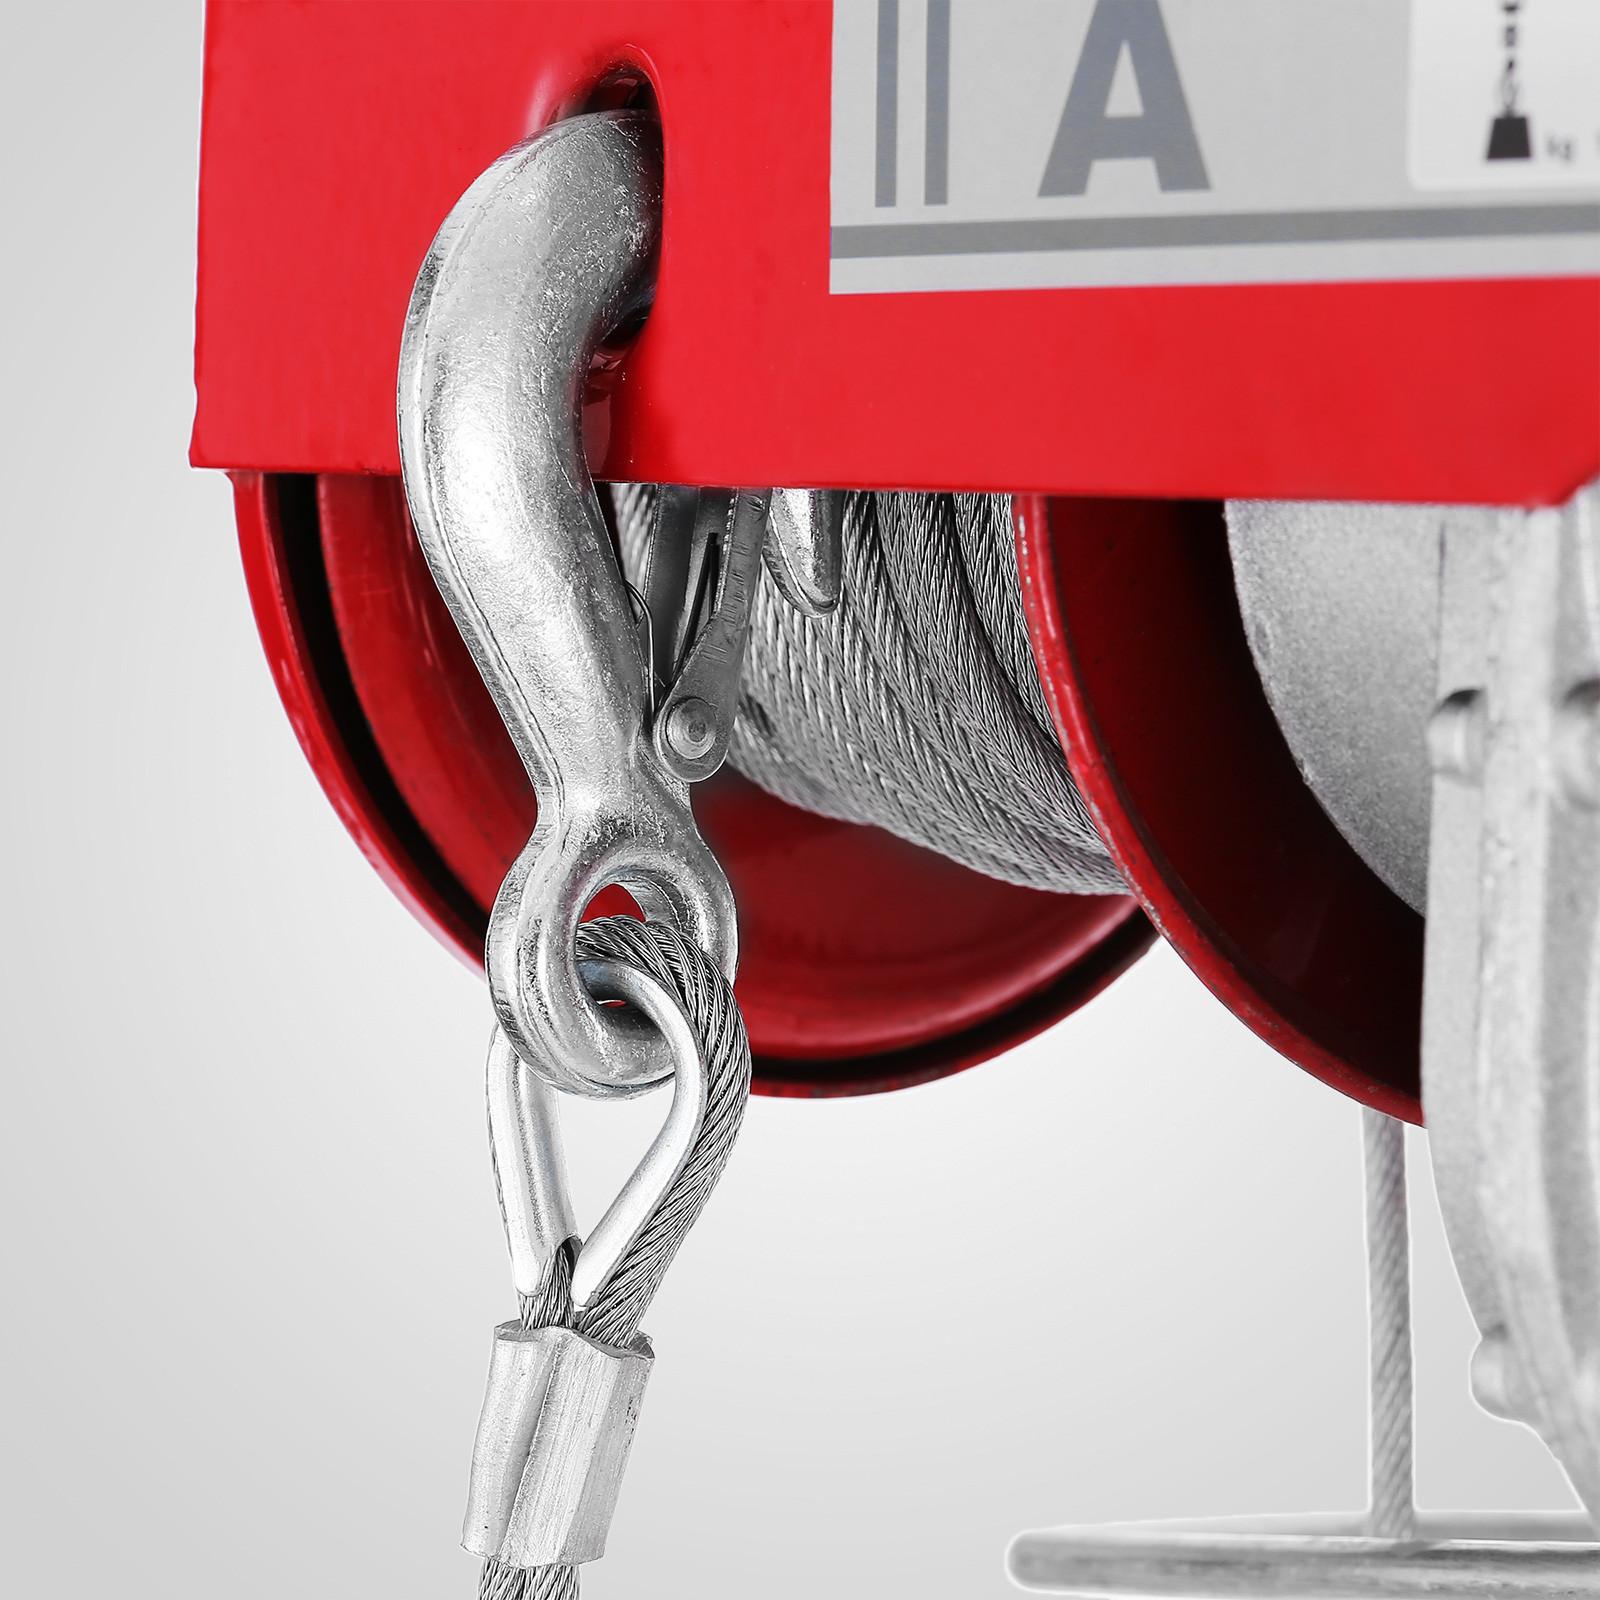 100kg-900kg-Electric-Hoist-Winch-Lifting-Engine-Crane-Cable-Lift-Hook-Garage miniature 33